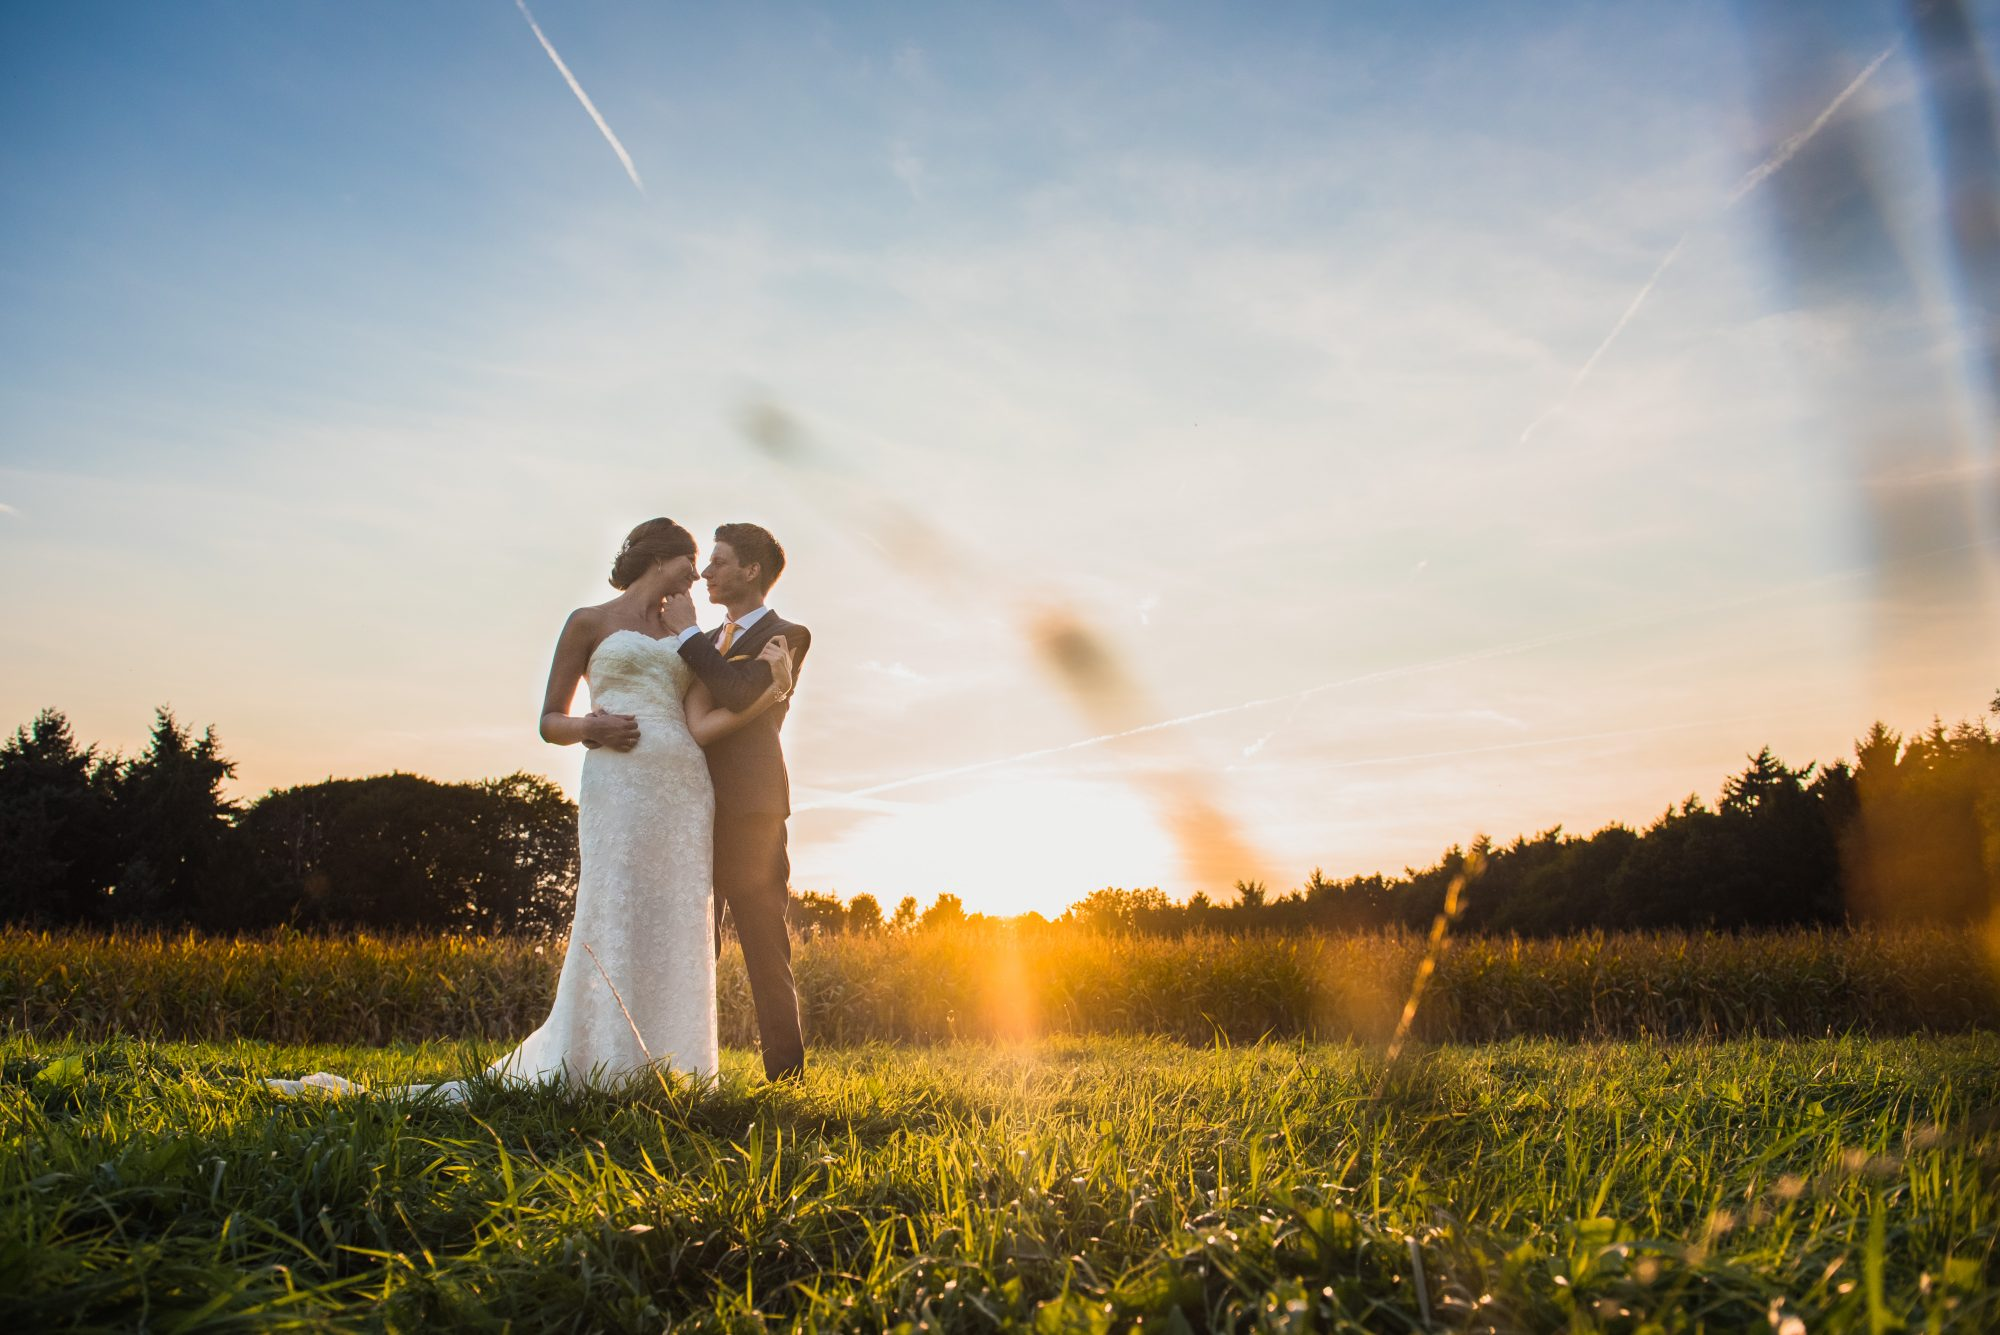 bruiloft-roland-annewil-662